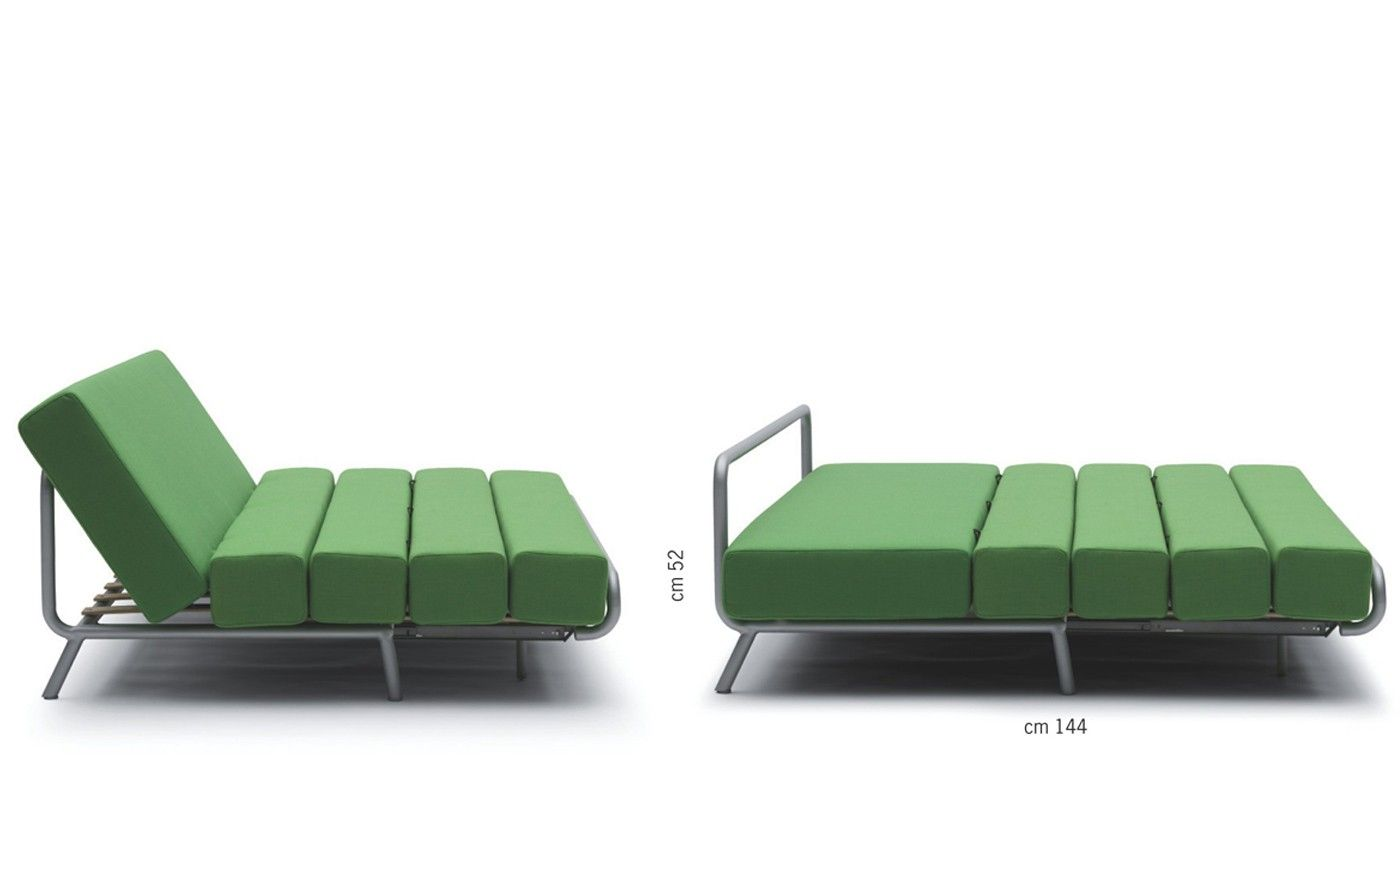 Genial Design Schlafsofa Deutsche Deko Pinterest